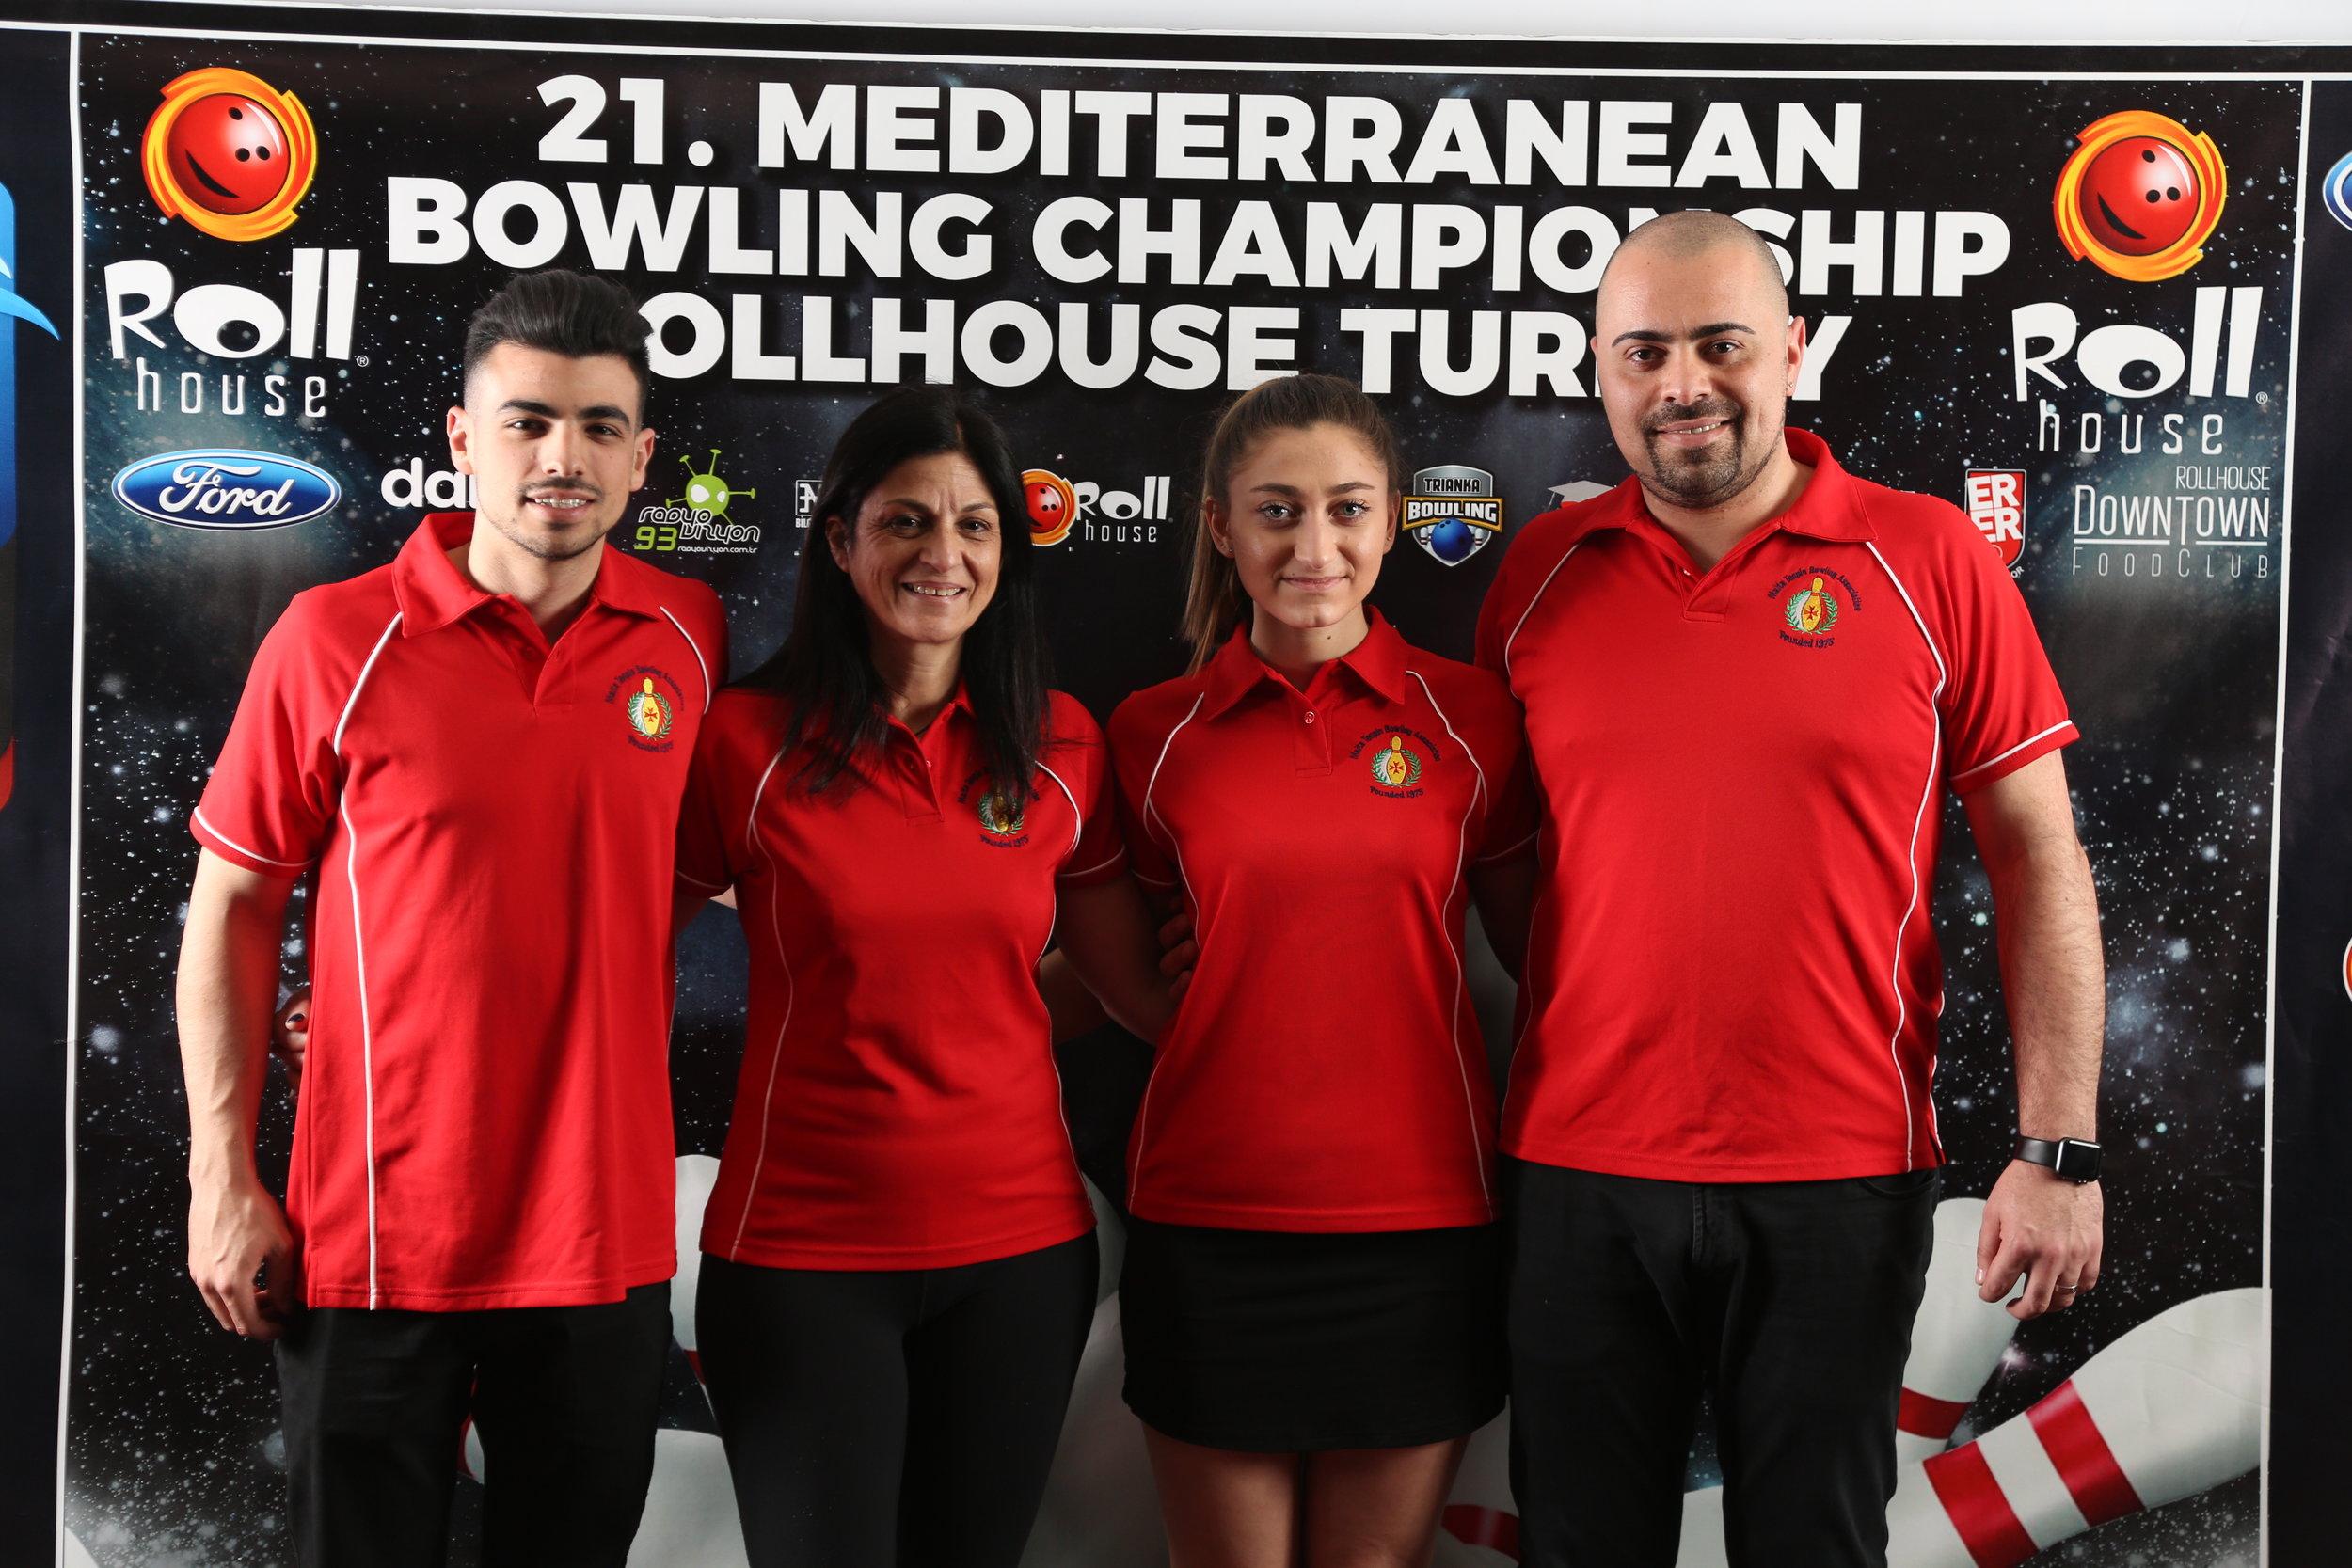 Team Malta